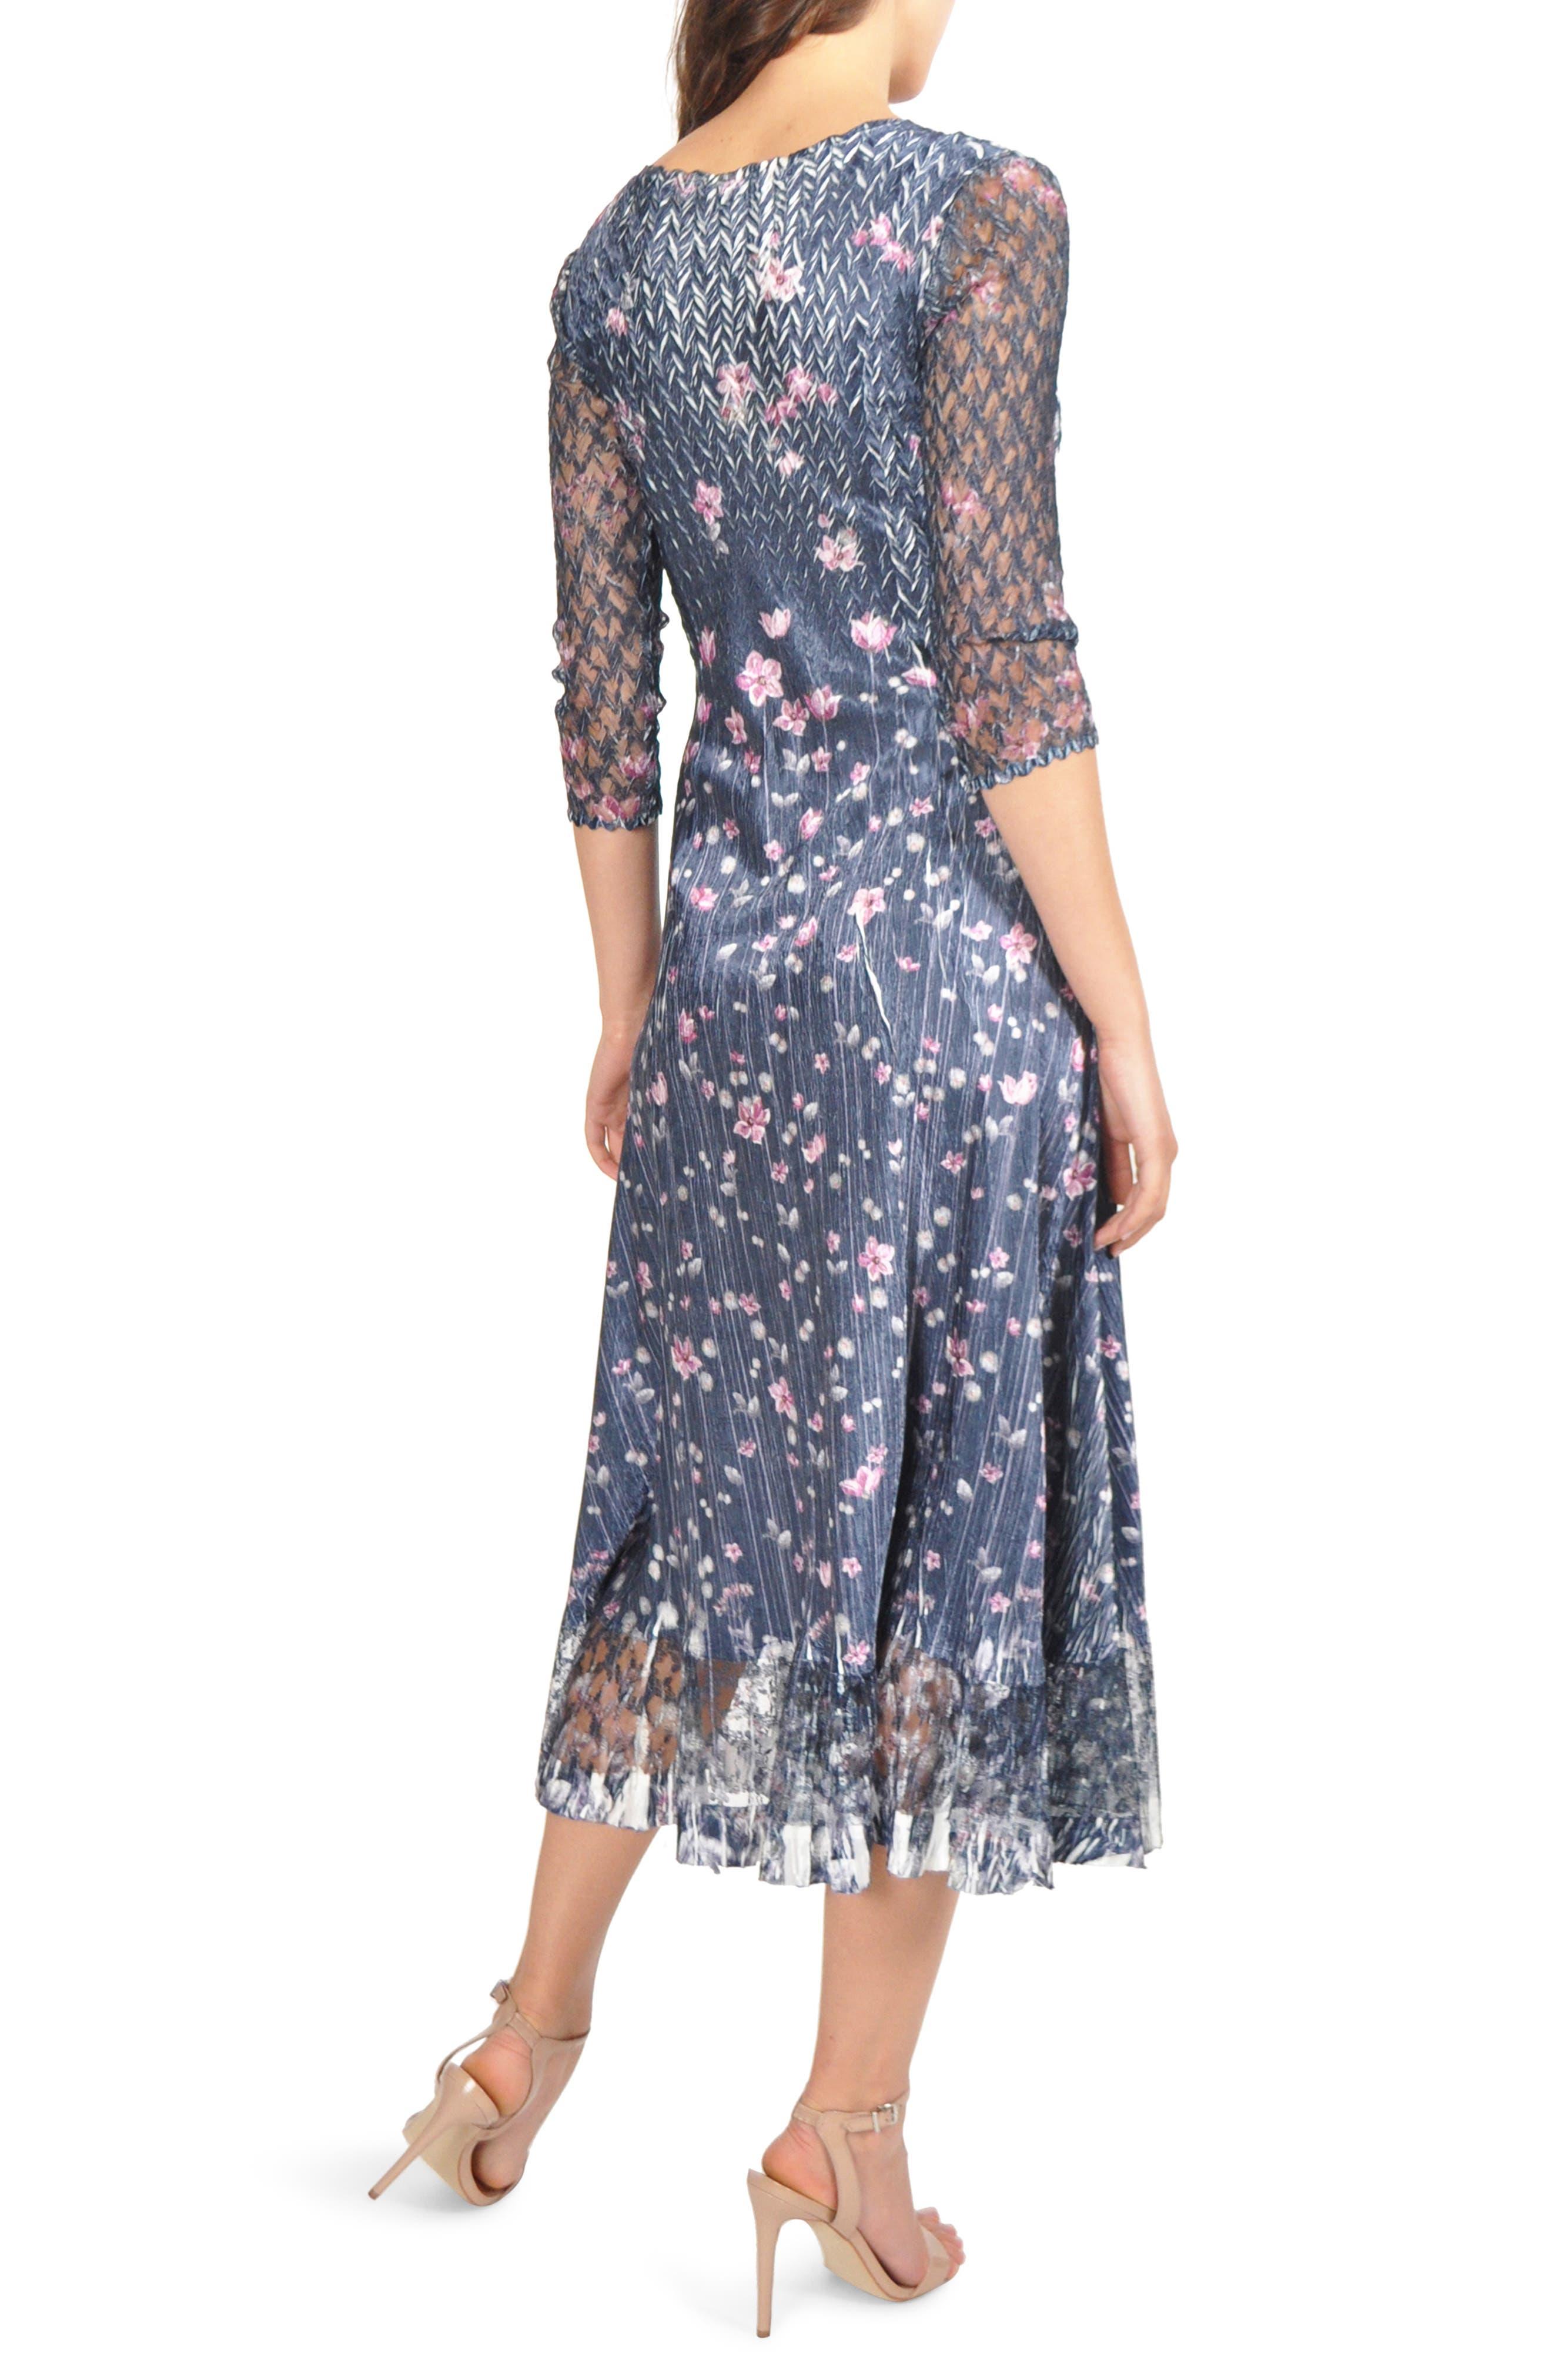 KOMAROV, Lace Sleeve Charmeuse Midi Dress, Alternate thumbnail 2, color, WILD THISTLE